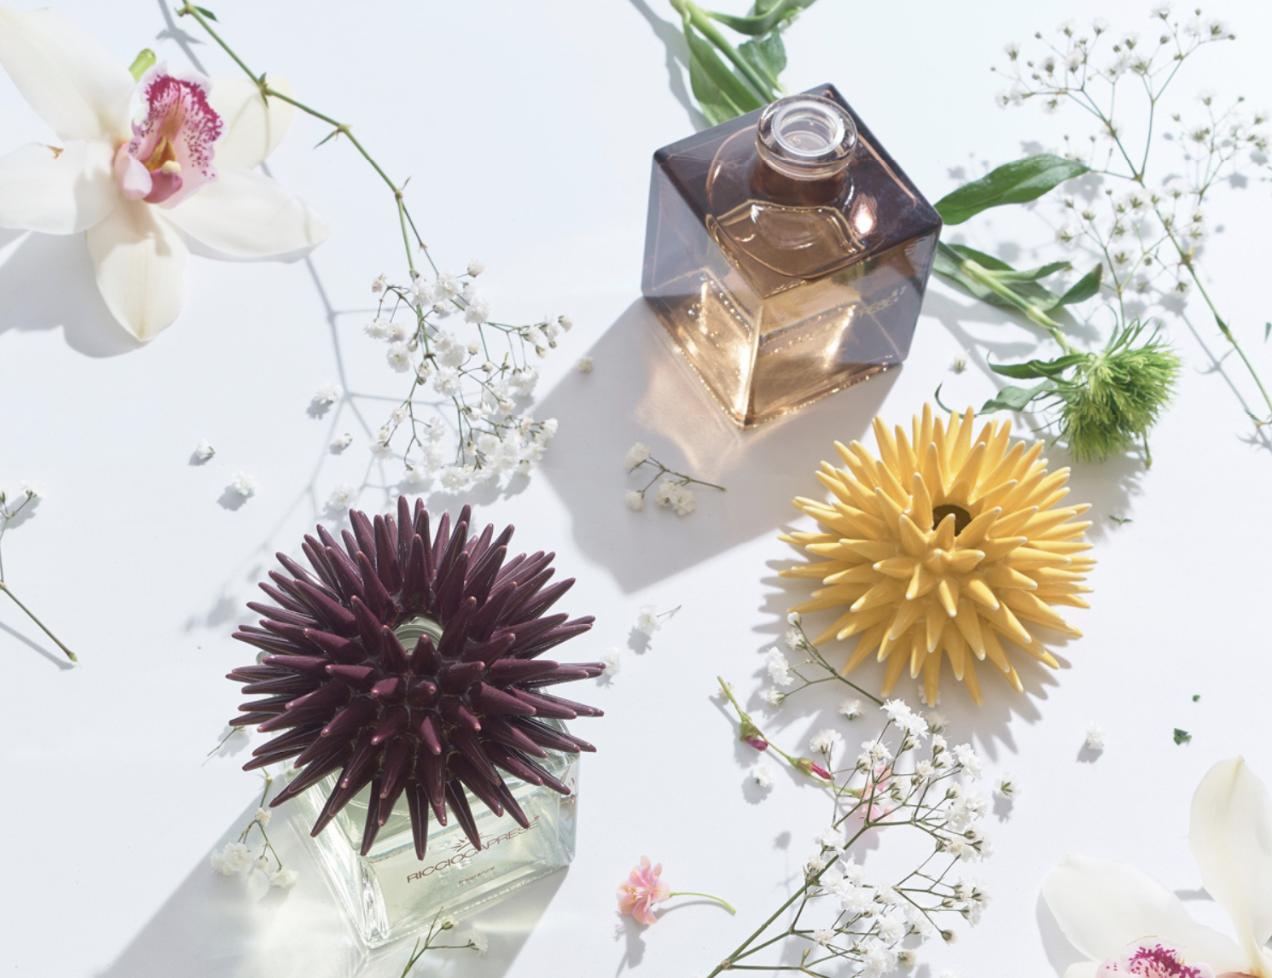 riccio-caprese-fragranze-capri-design-italia